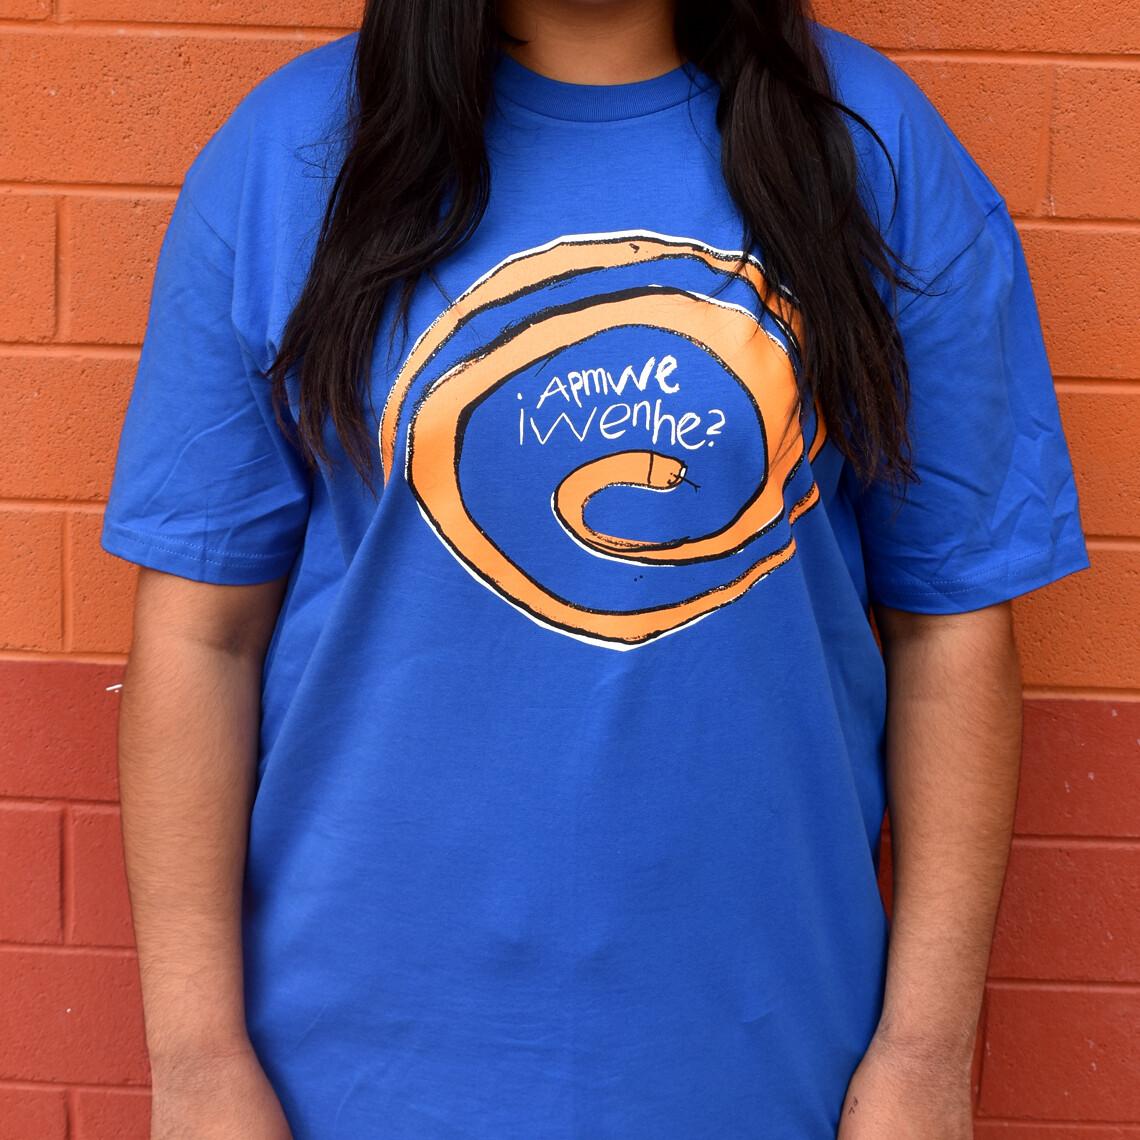 Apmwe Iwenhe? (What Snake?) T-shirt: blue